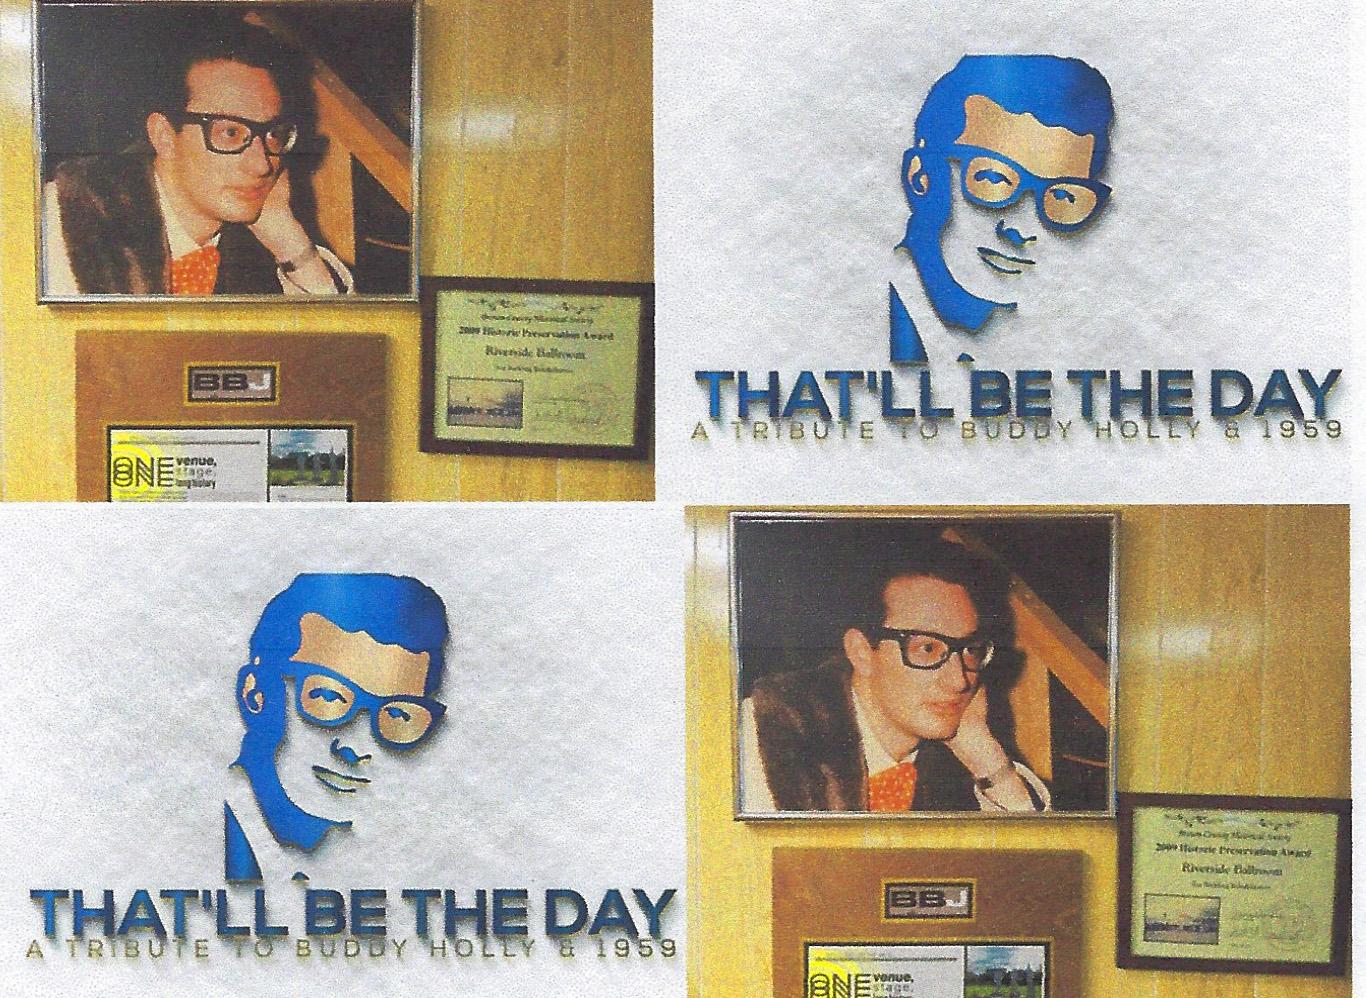 Buddy Holly images_1536332126777.jpg.jpg